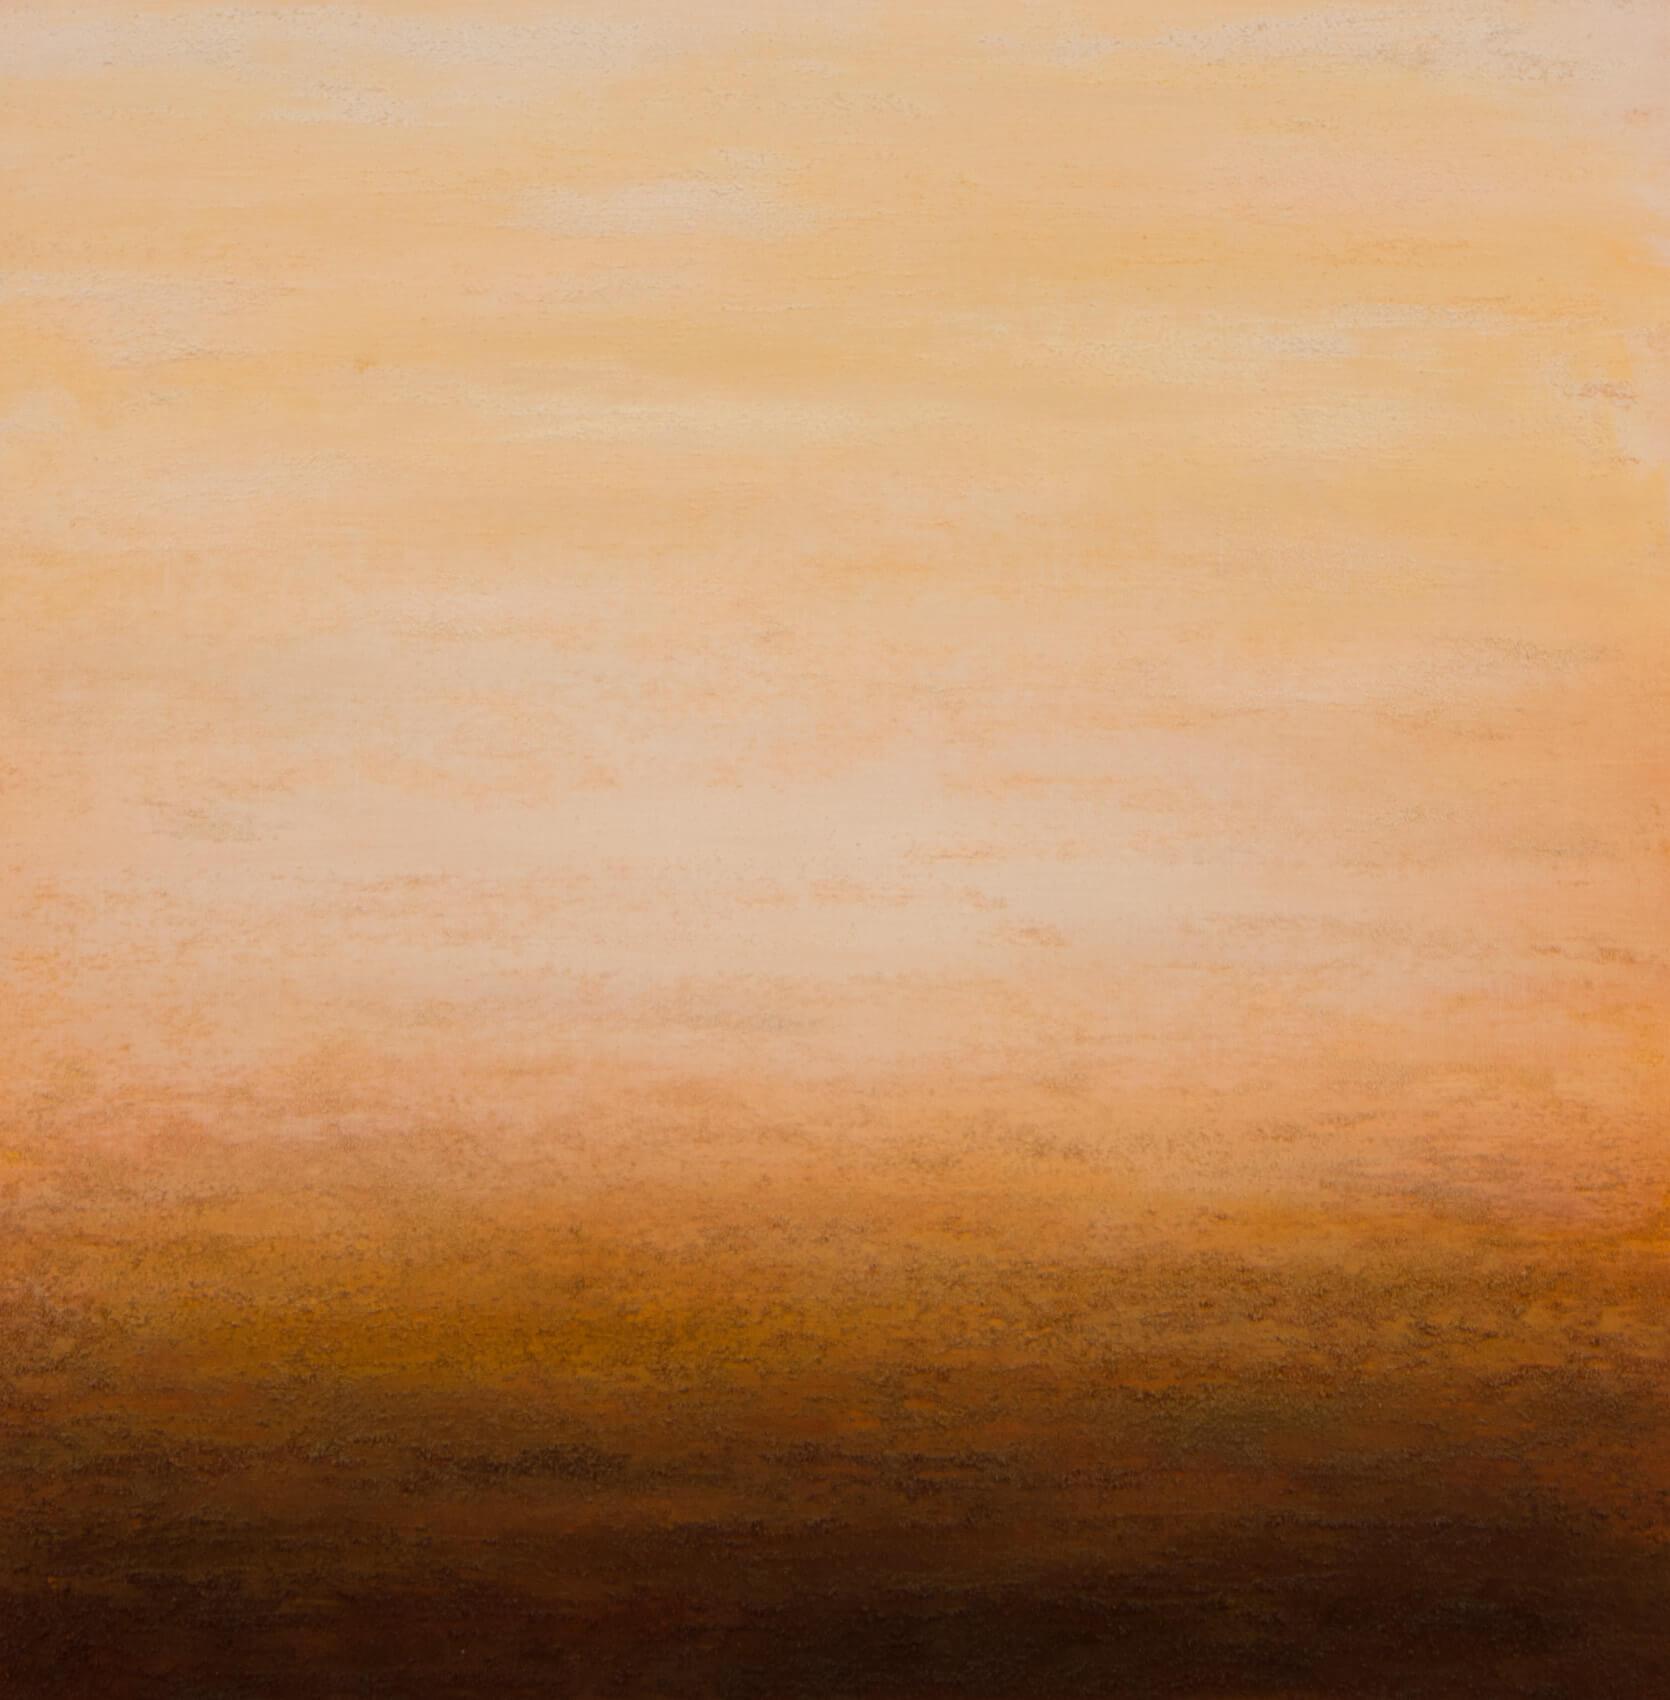 Essència-de-Paisatge-26-60x60 Camil Giralt